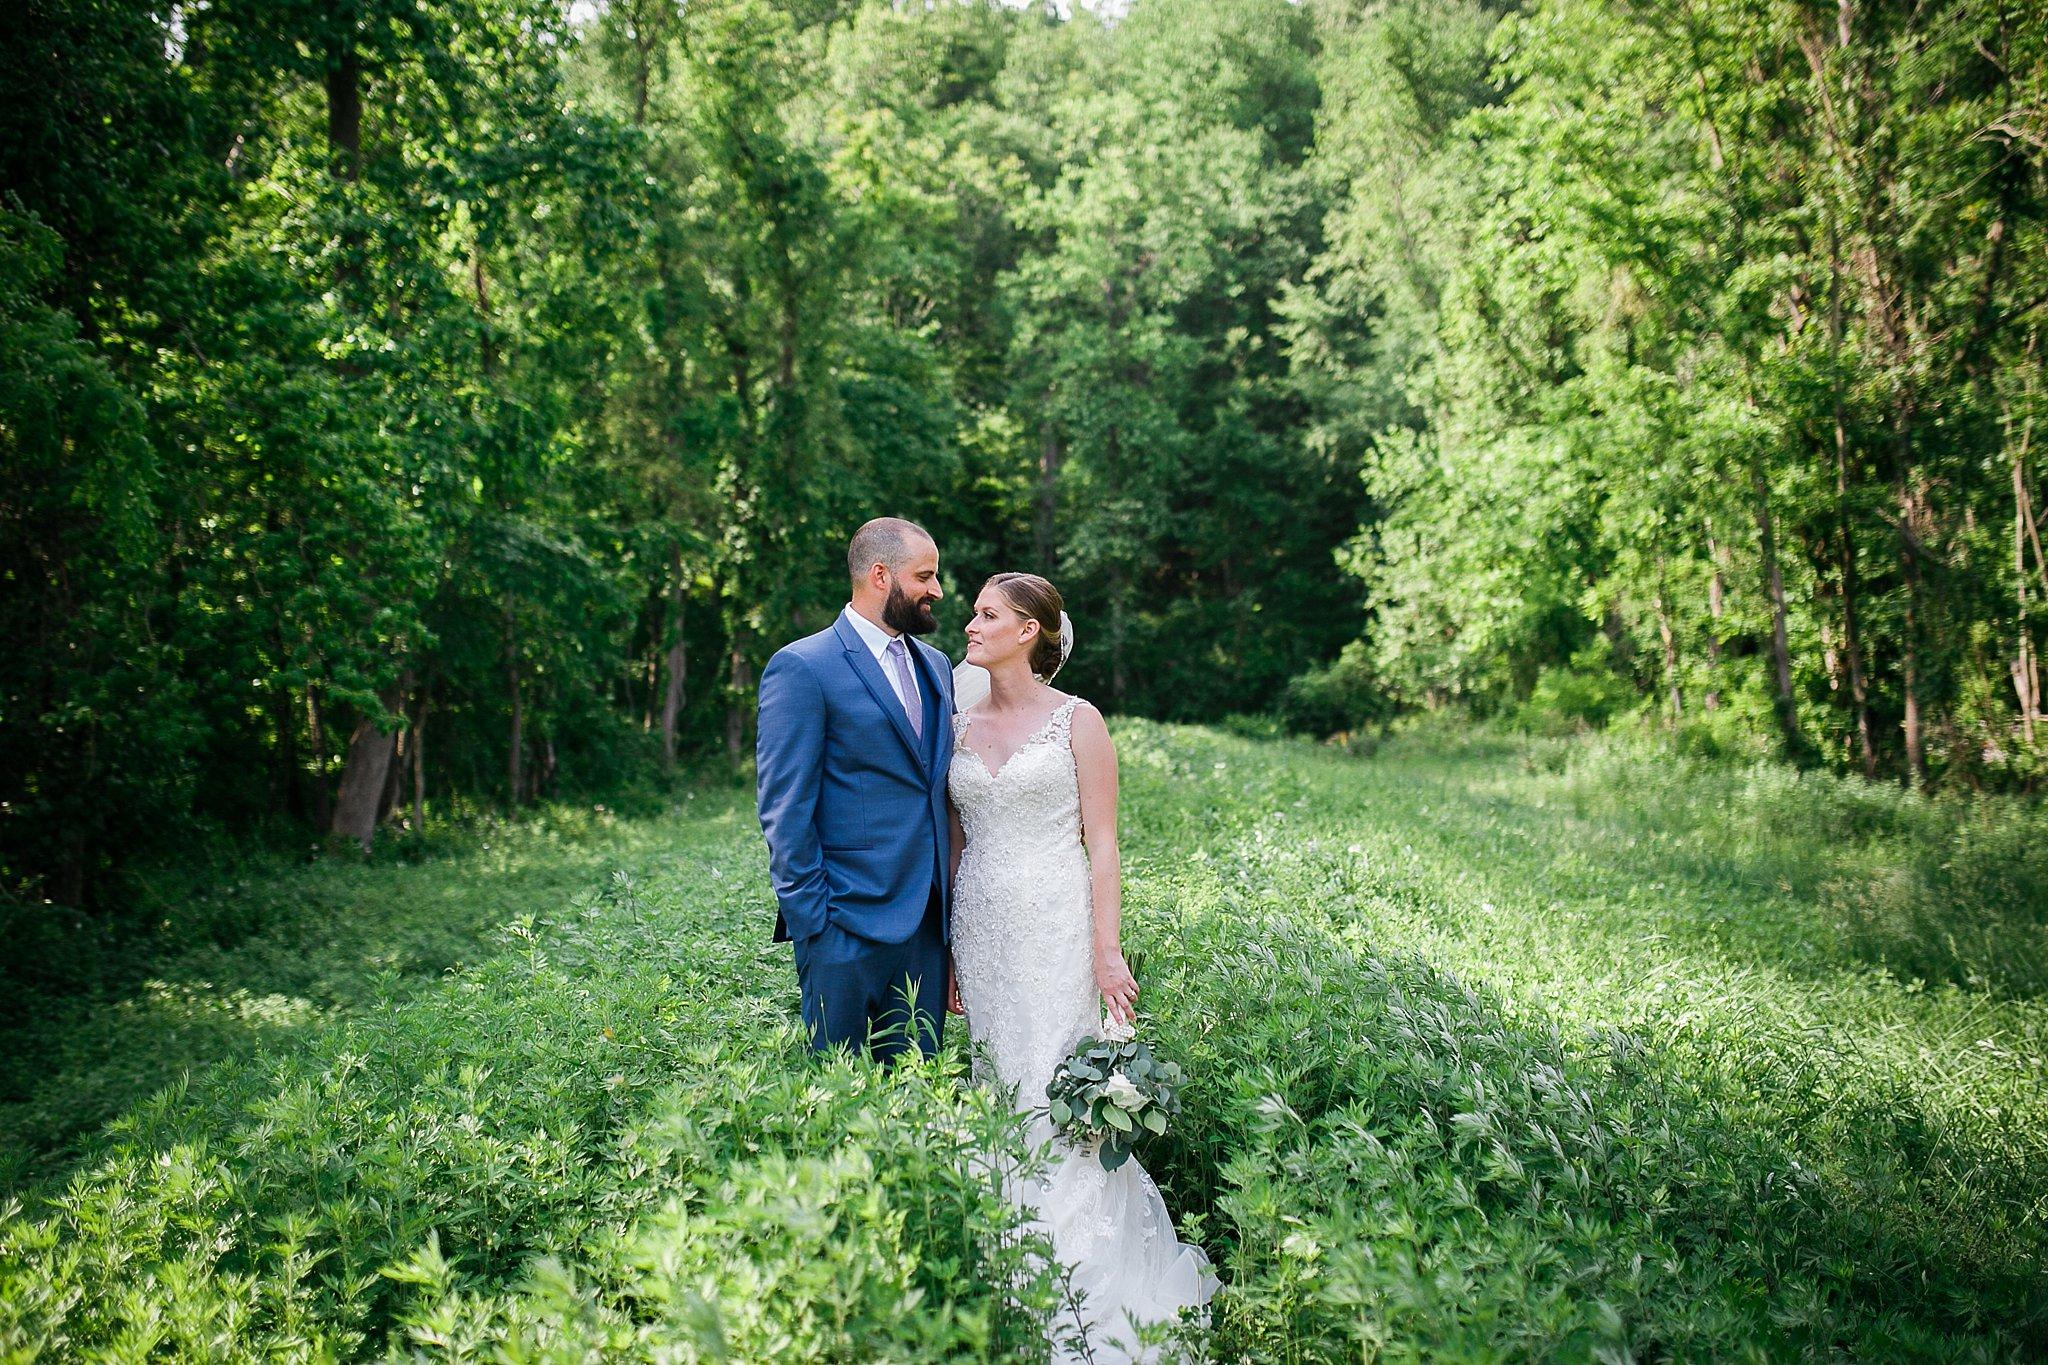 Hollow Brook Golf Club Cortlandt Manor NY Wedding Sweet Alice Photography June Wedding67.jpg